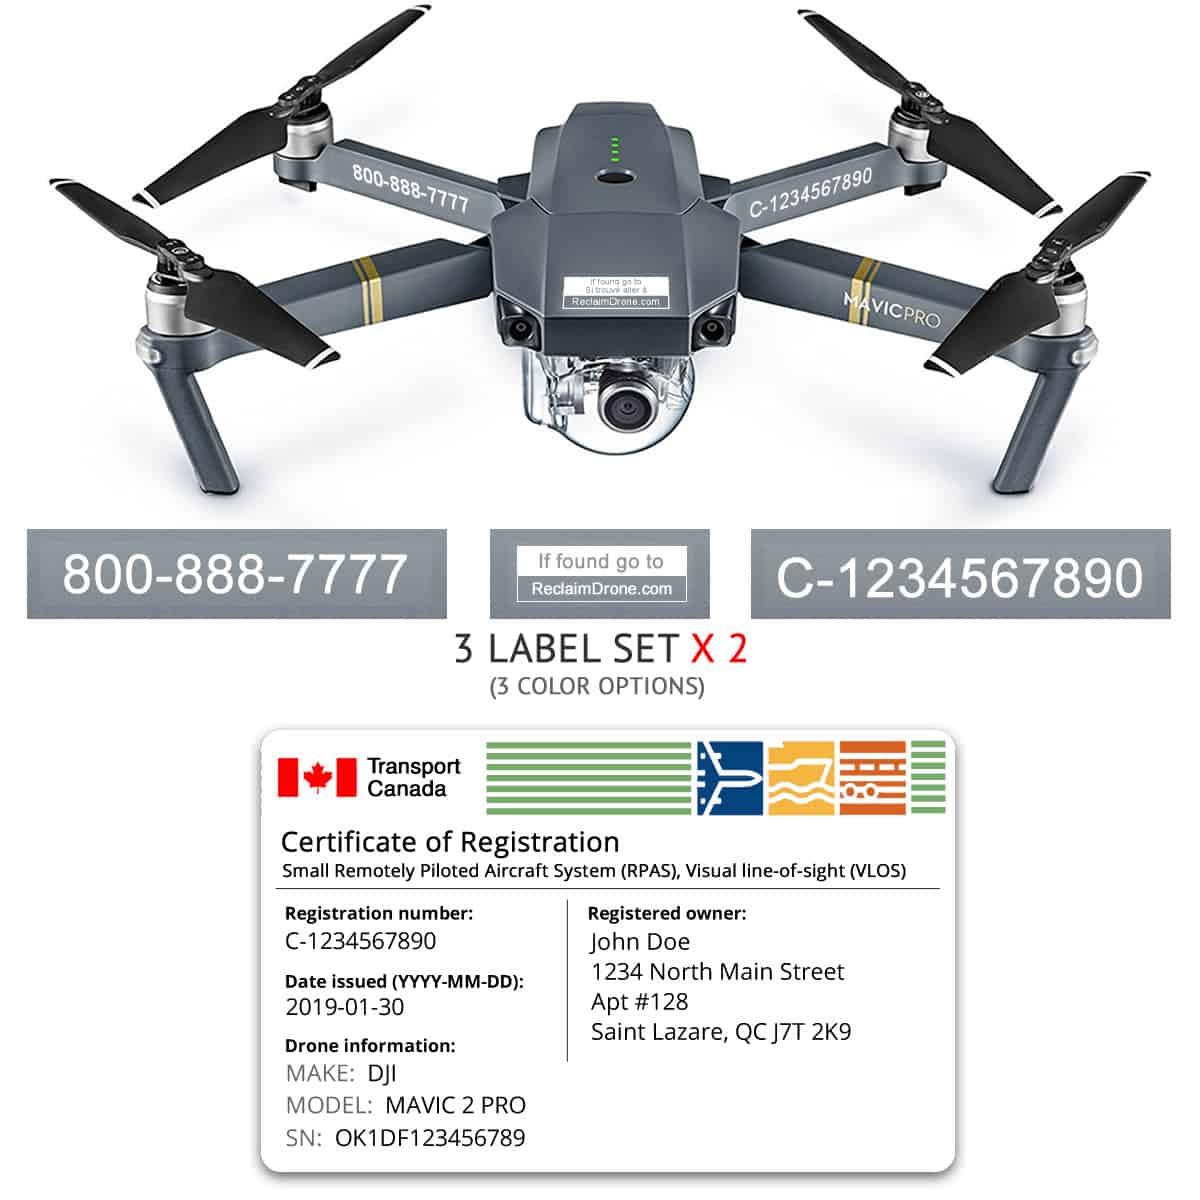 Mavic Pro drone registration bundle for Canada